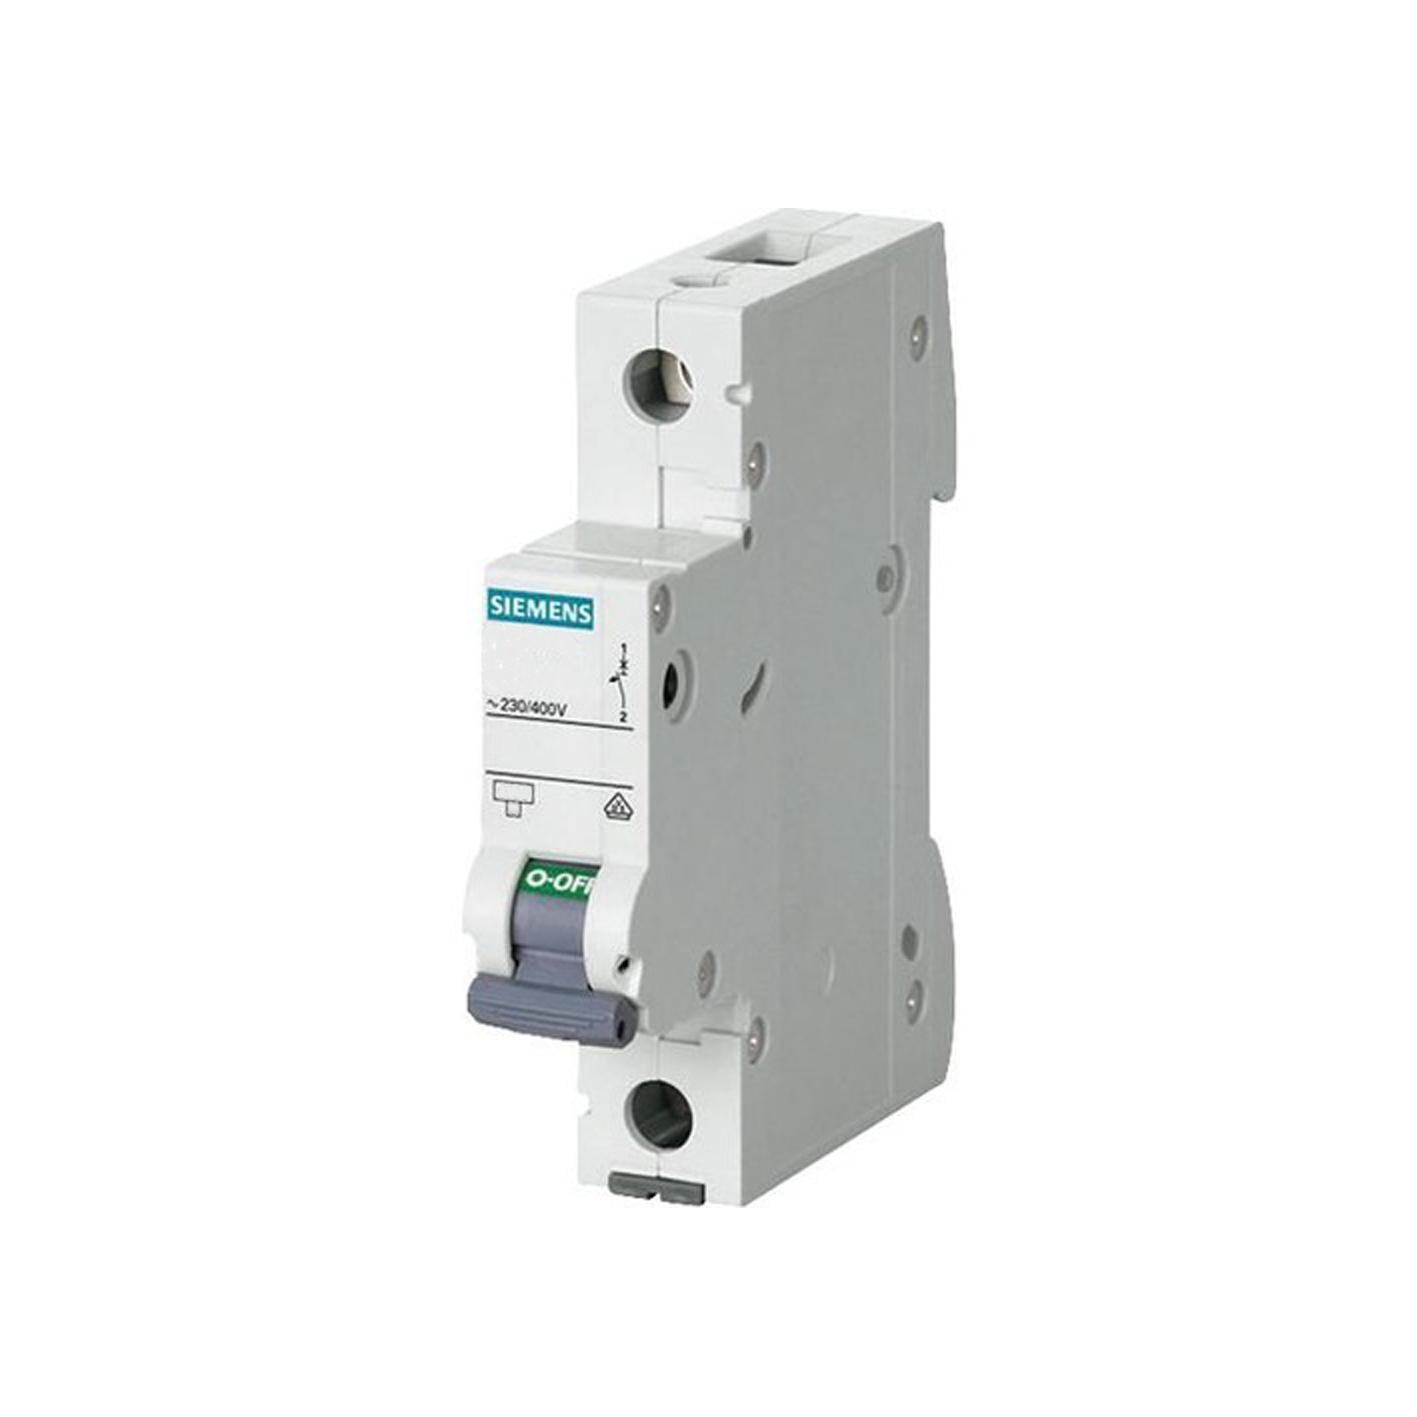 Siemens 1x2A Otomatik Sigorta